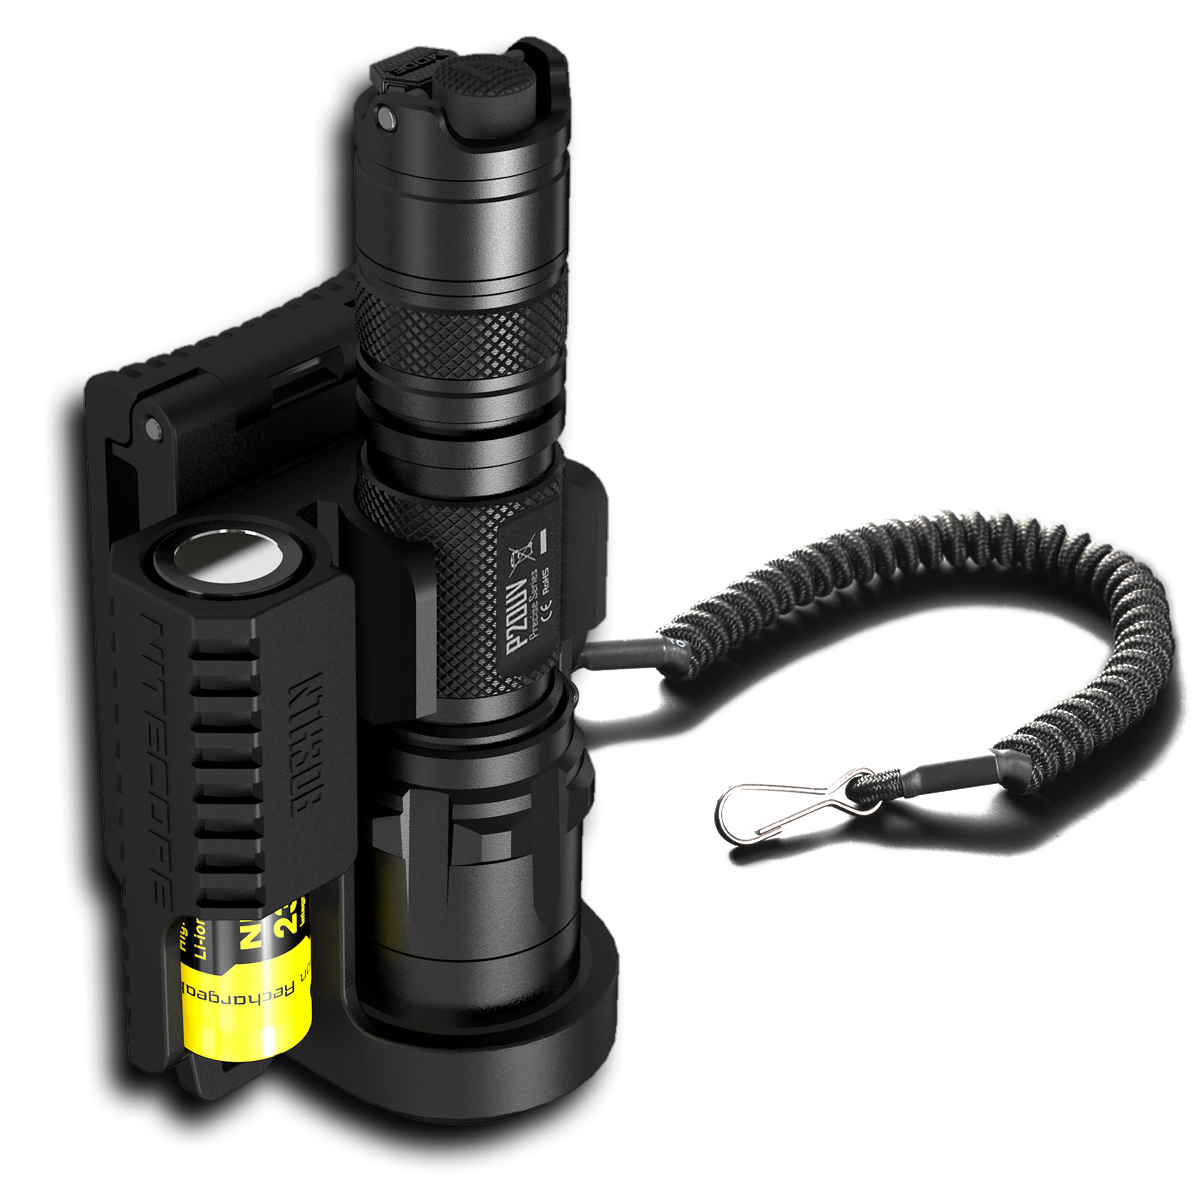 Discount NITECORE P20 P20UV Tactical LED Flashlight Waterproof Outdoor Camp Hunt Portable NTL10+ NTH30B+ 2300mah Battery Package